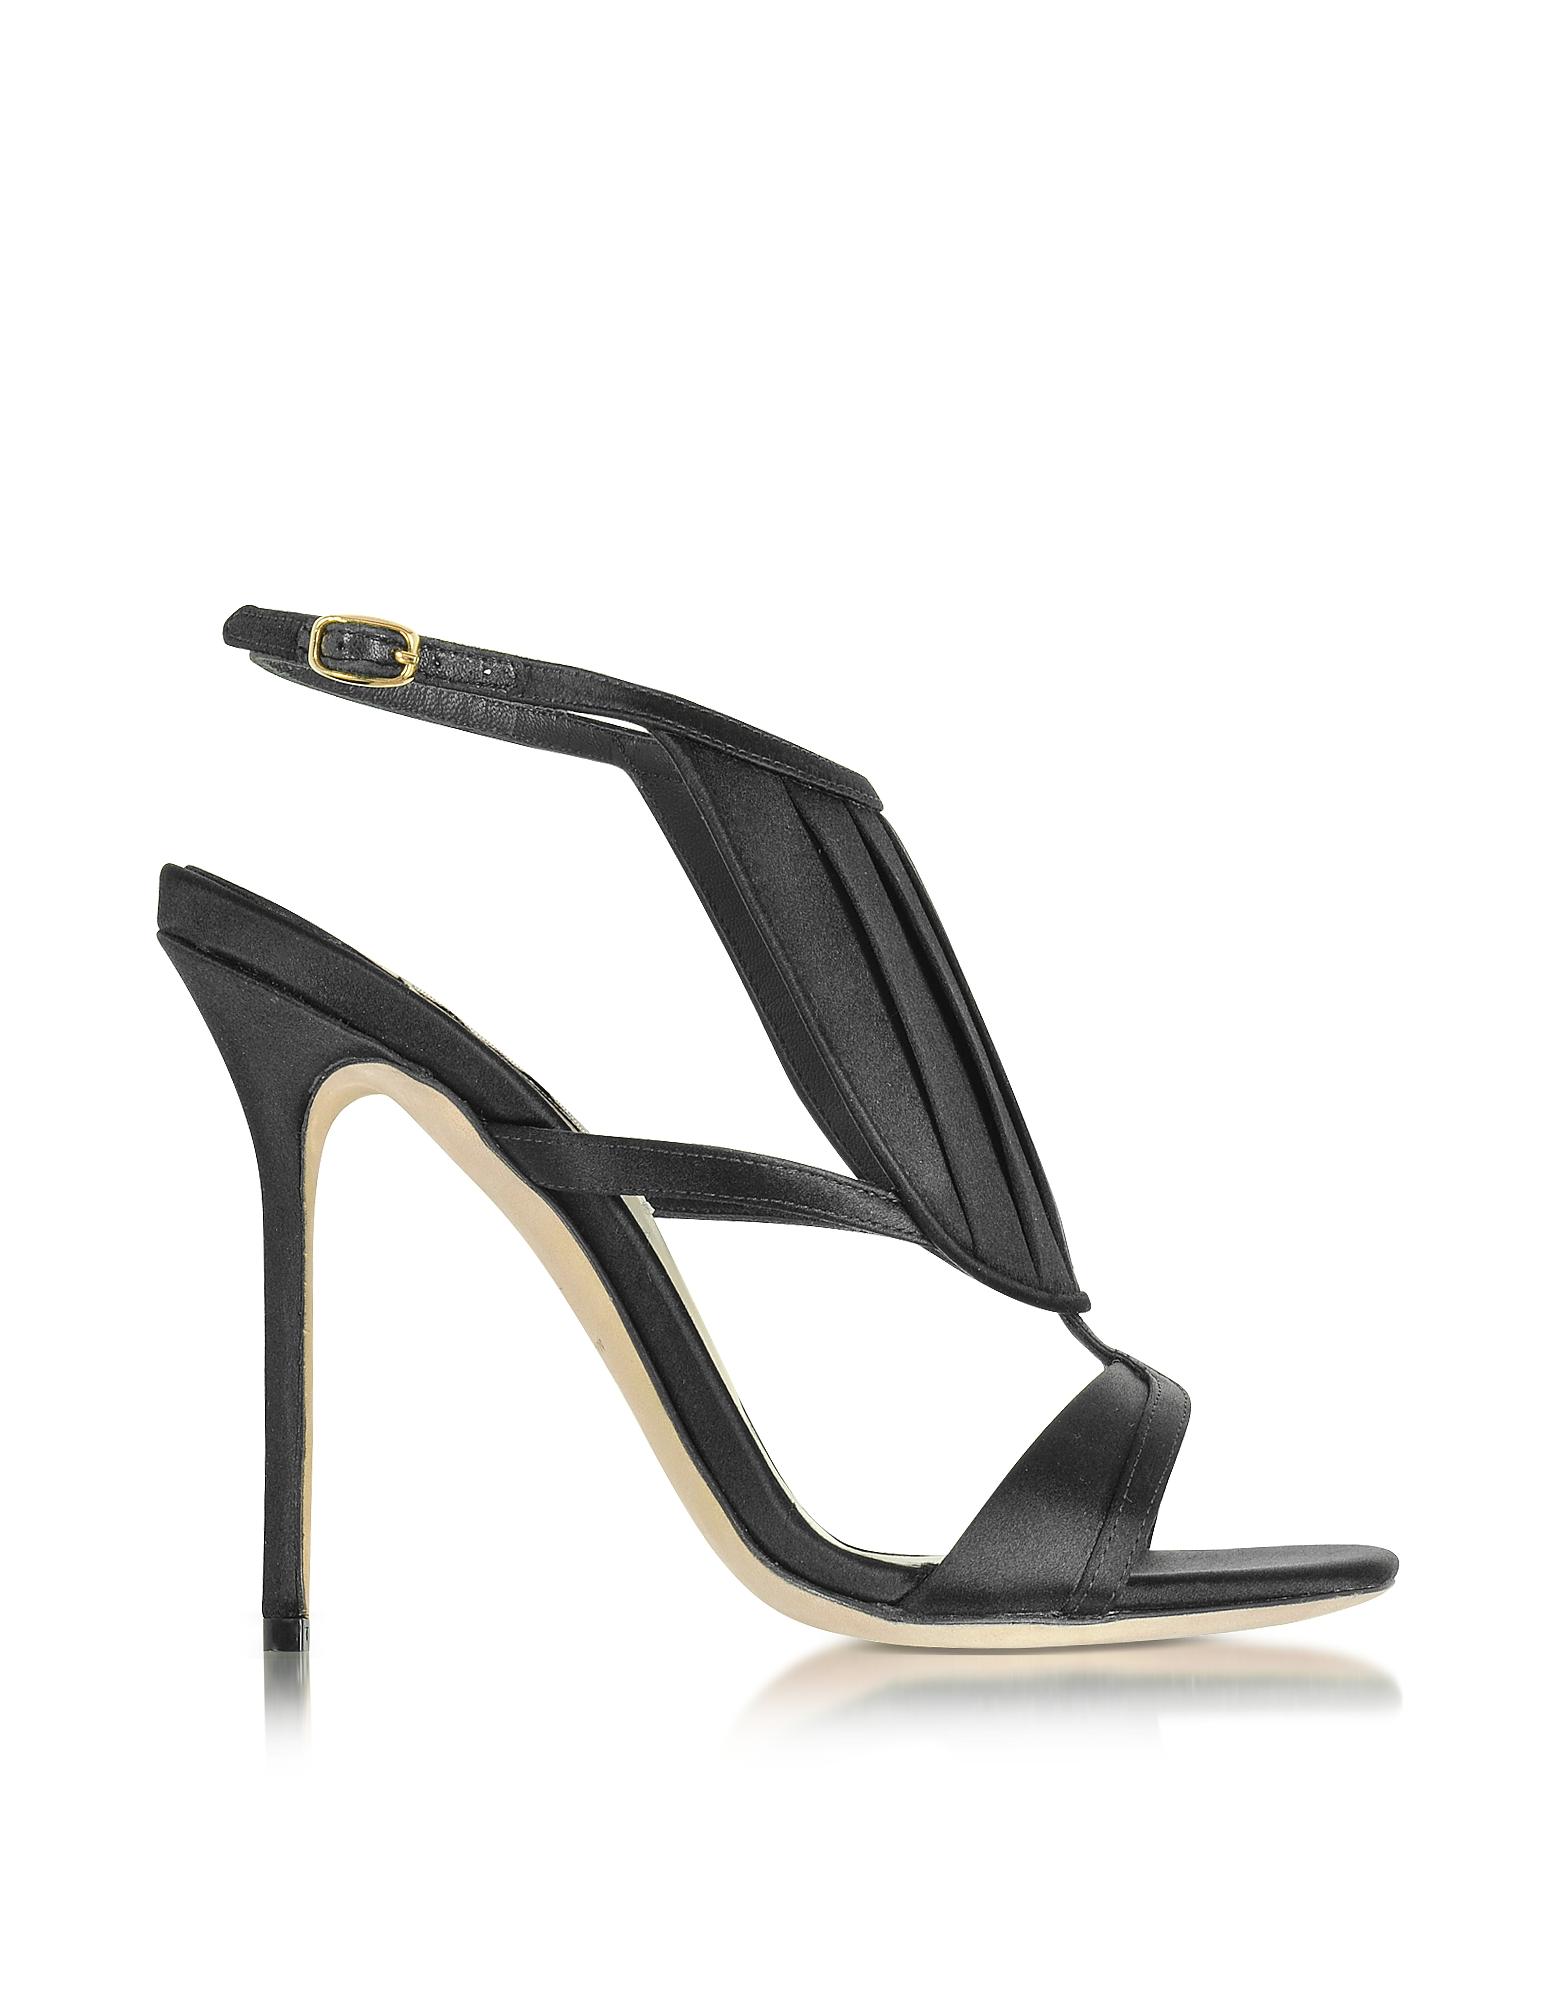 Olgana Paris Shoes, La Decouverte Black Satin Sandal